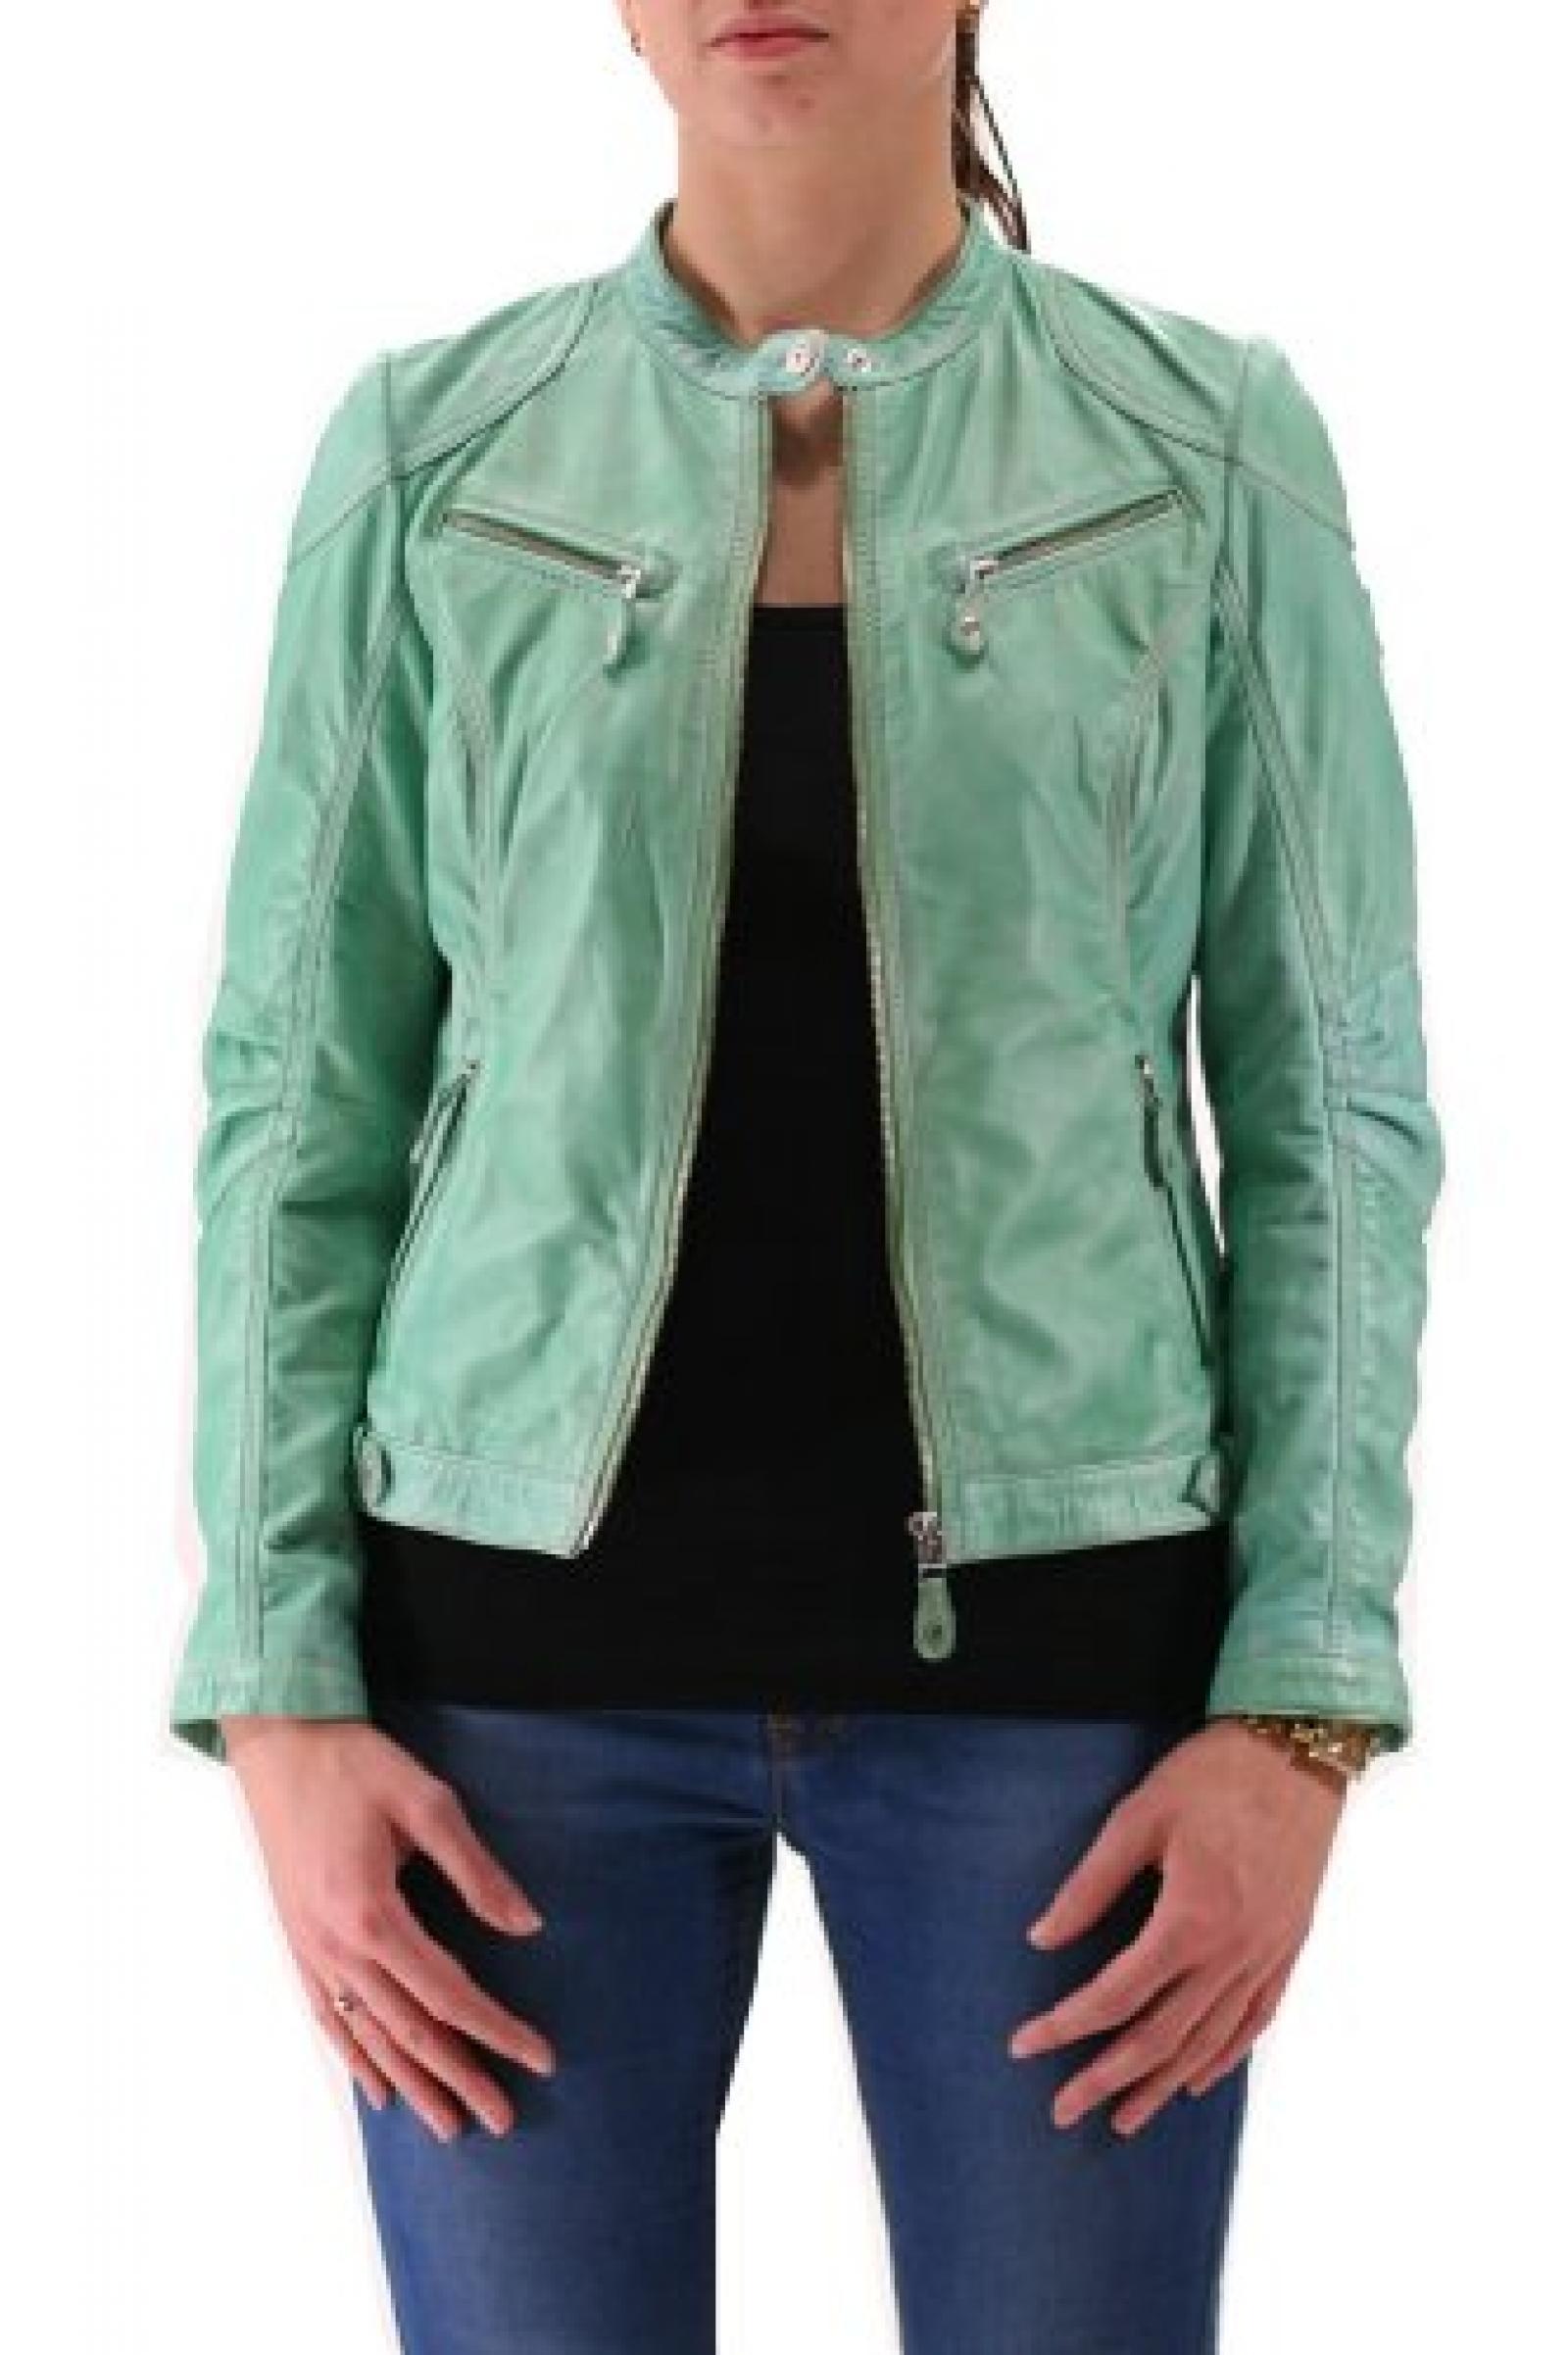 Jayda S14 LNAP Light Green Mauritius Lederjacke, Damen, Outerwear